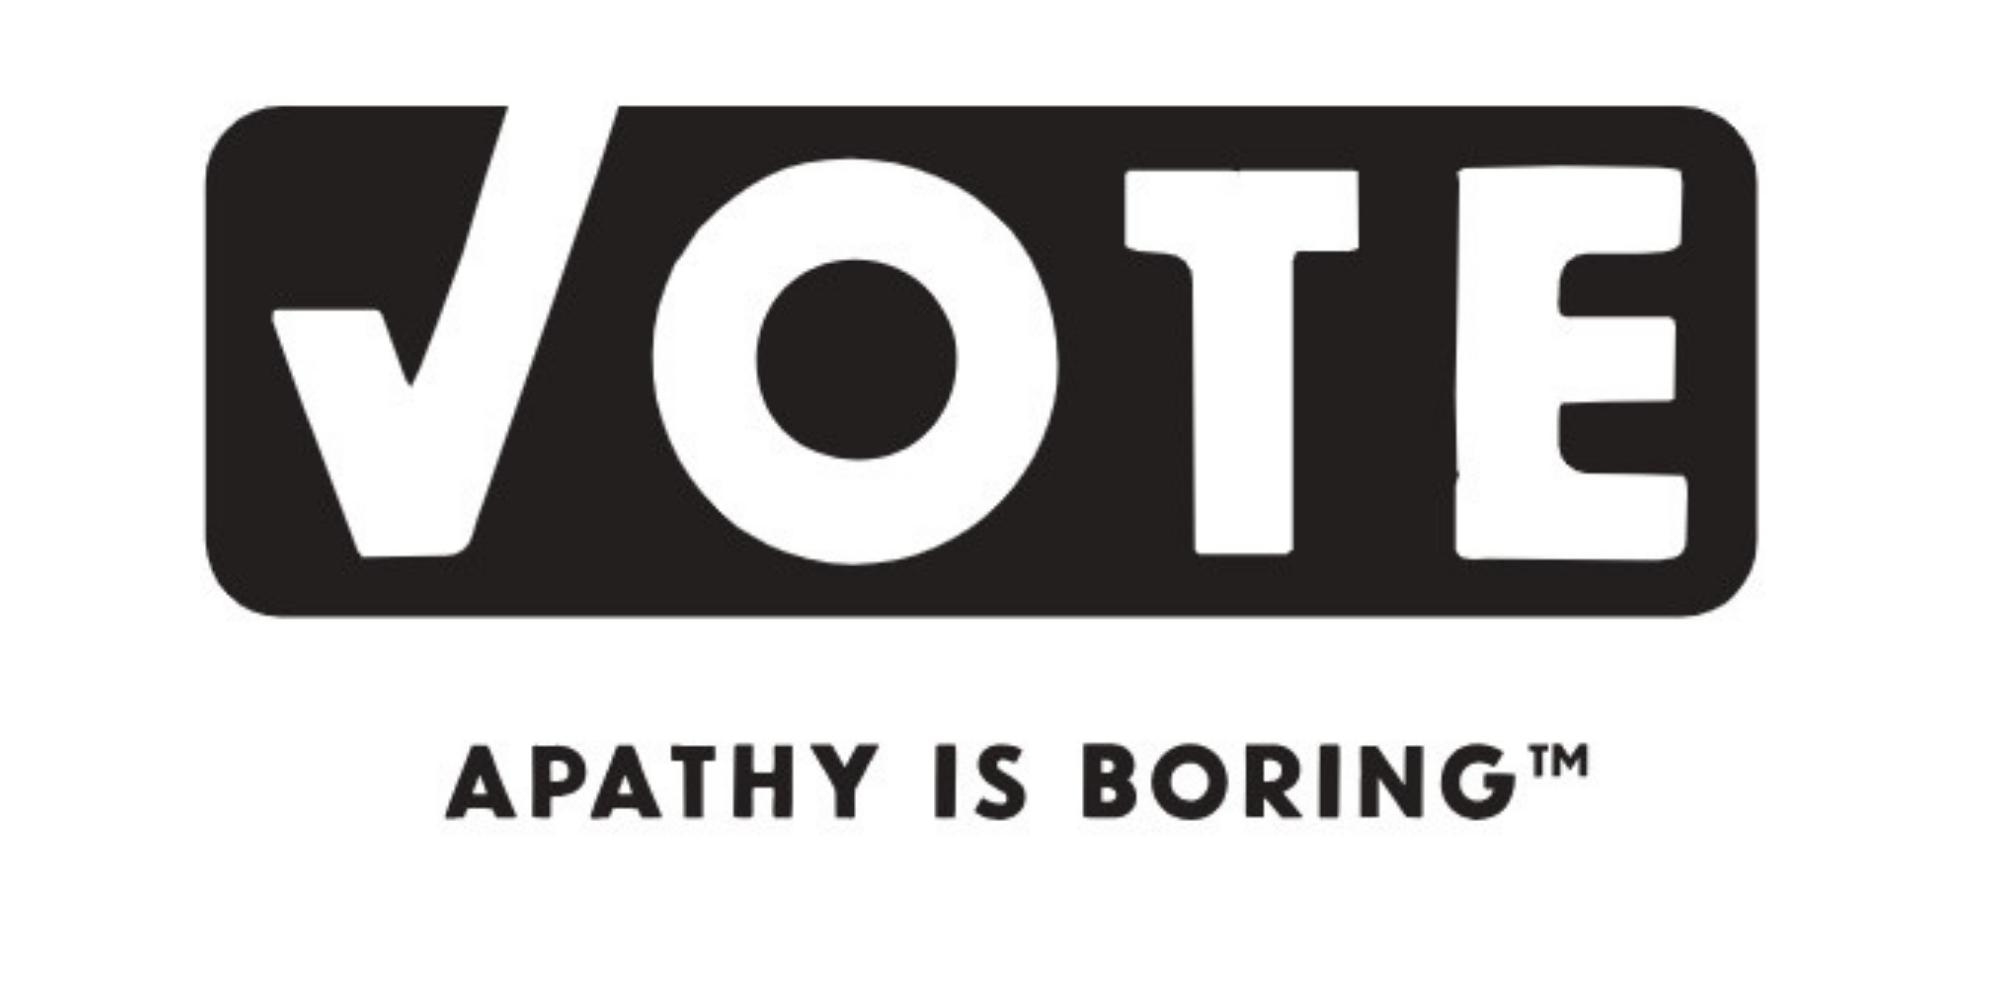 ApathyIsBoring_Vote.png